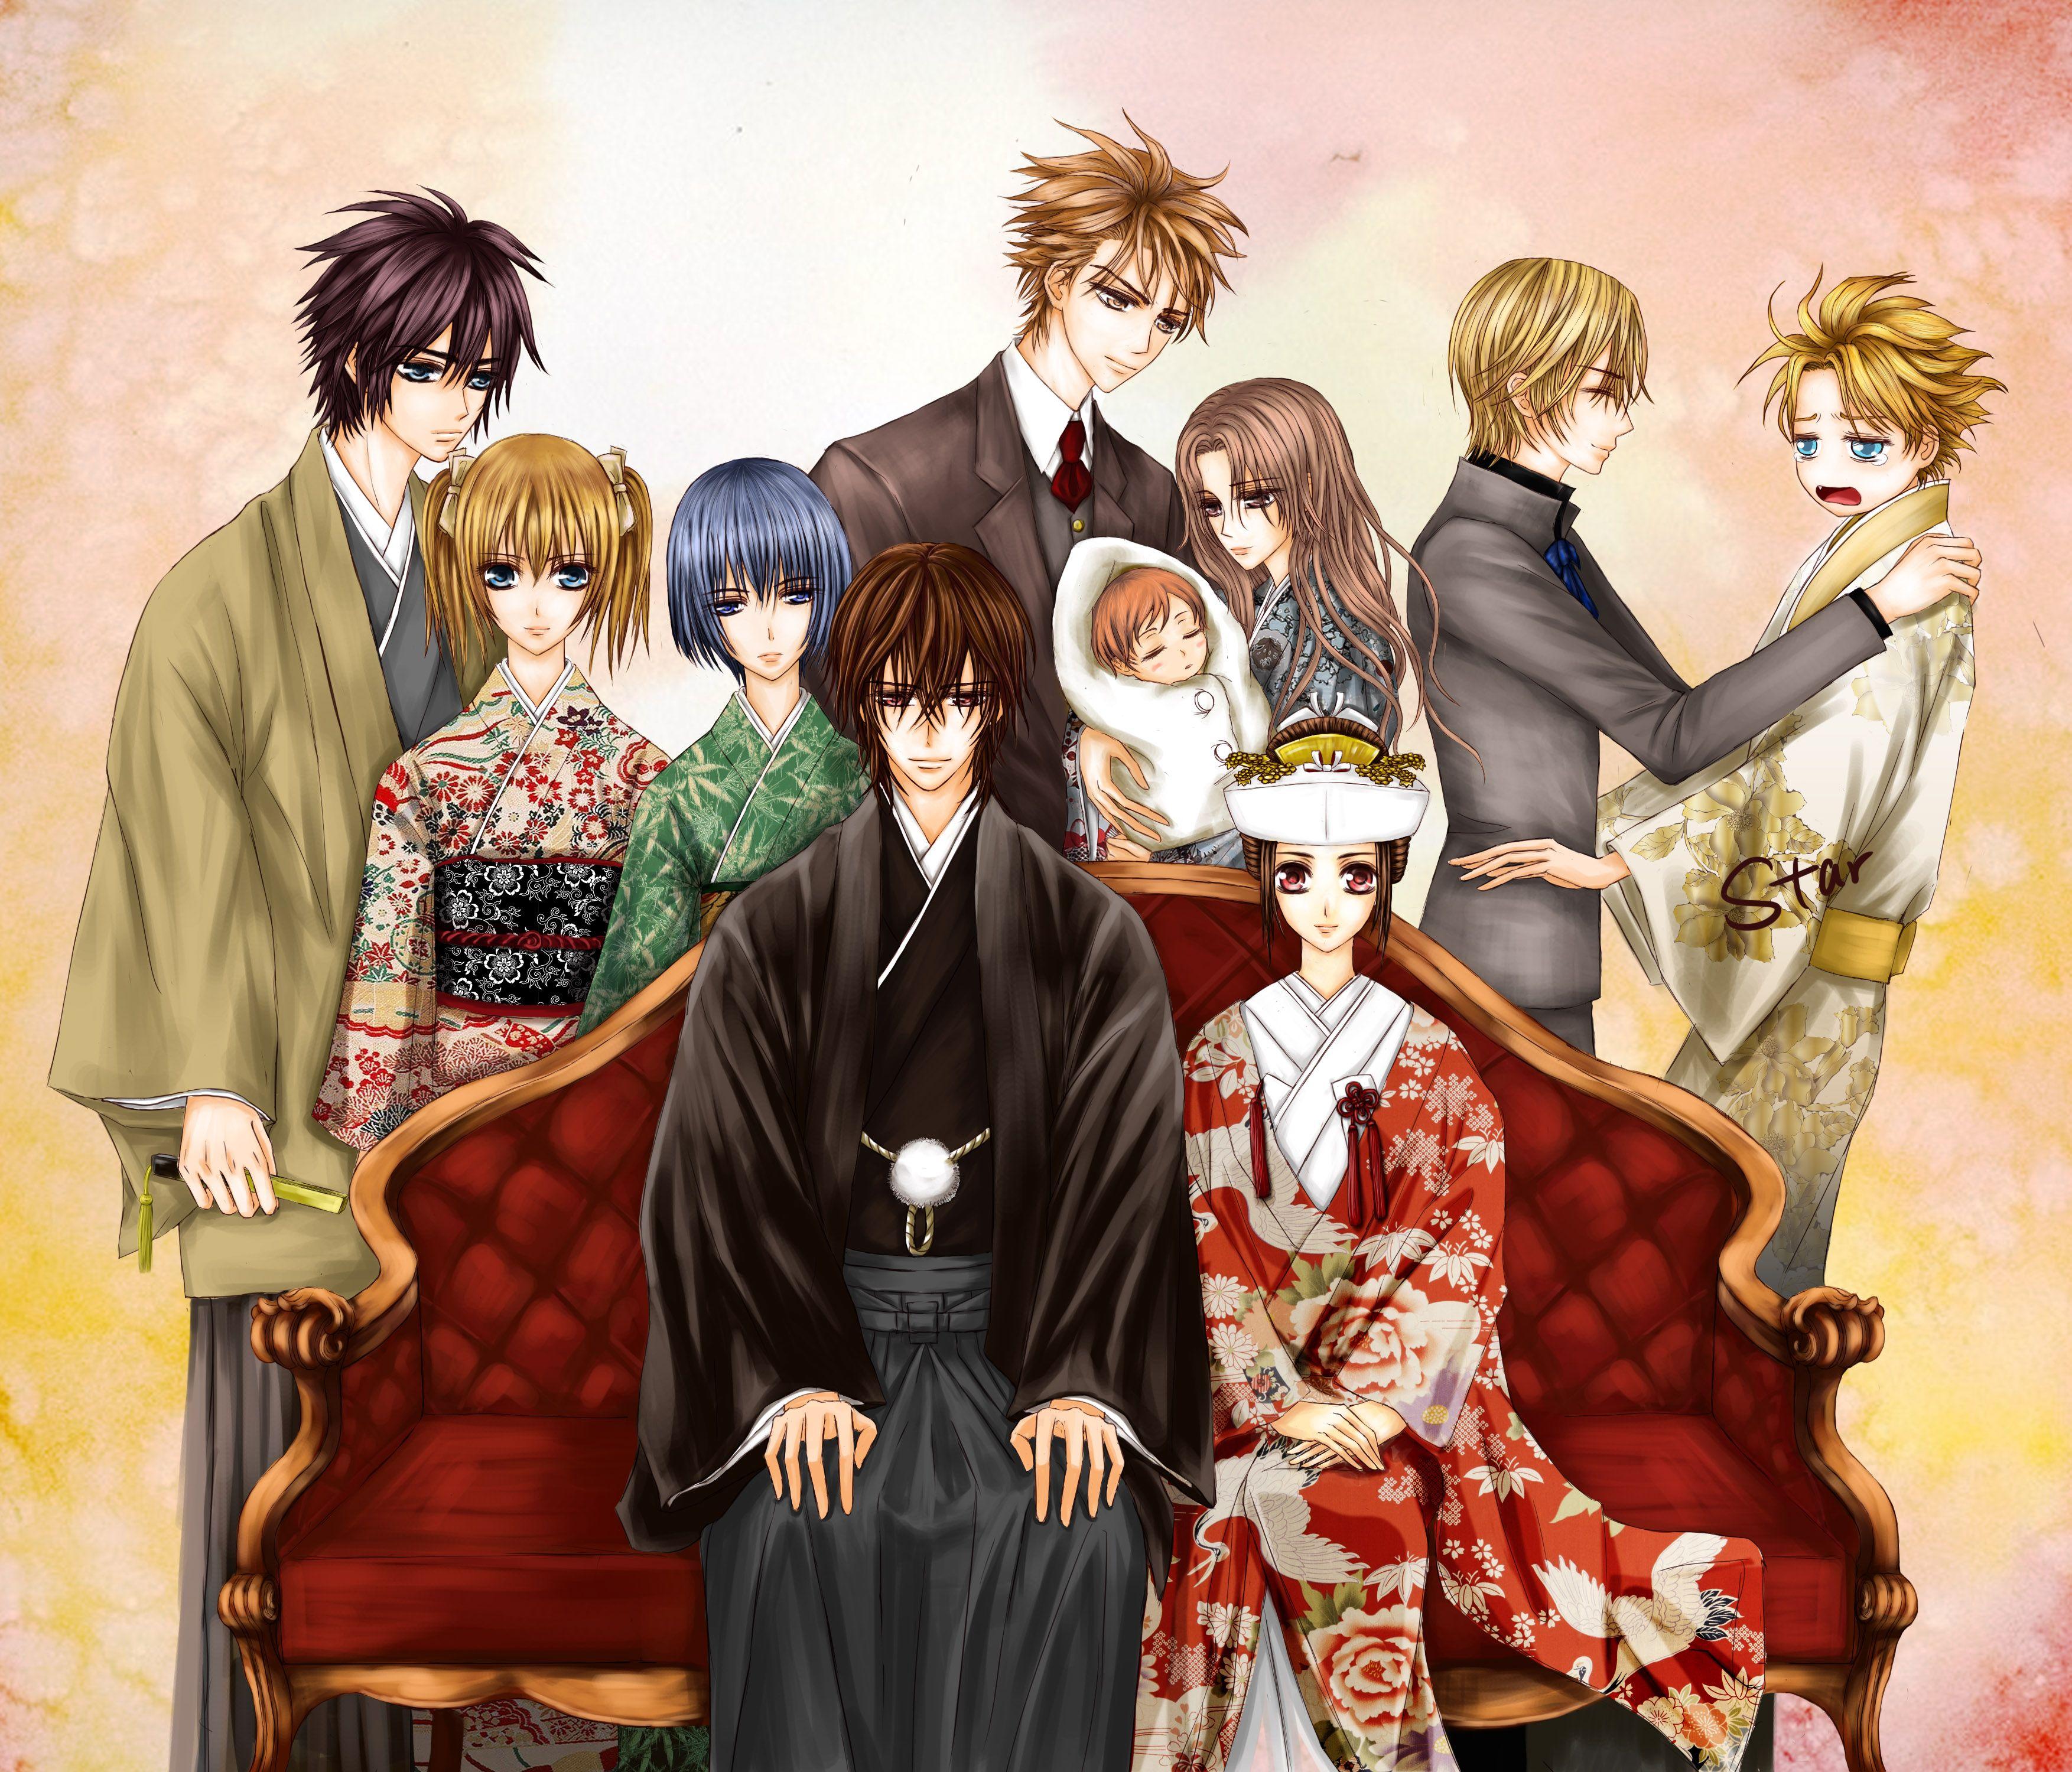 Anime & Manga Vampire knight yuki, Vampire knight kaname